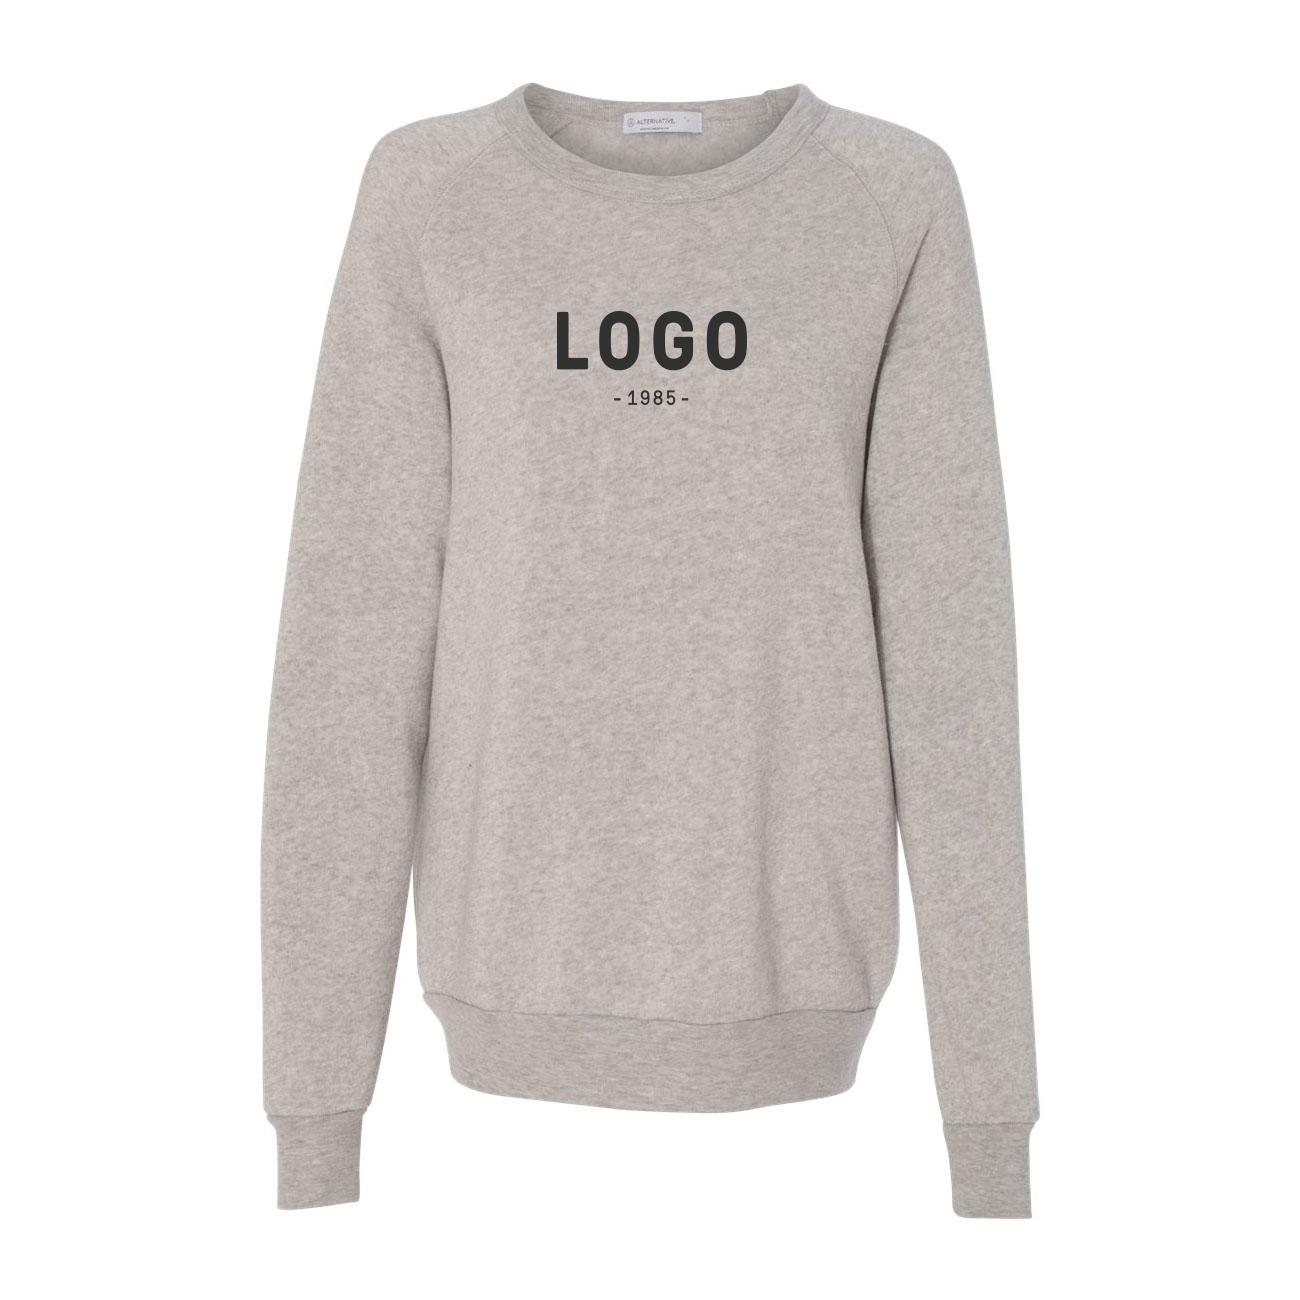 122733 champ crewneck sweatshirt one color one location imprint